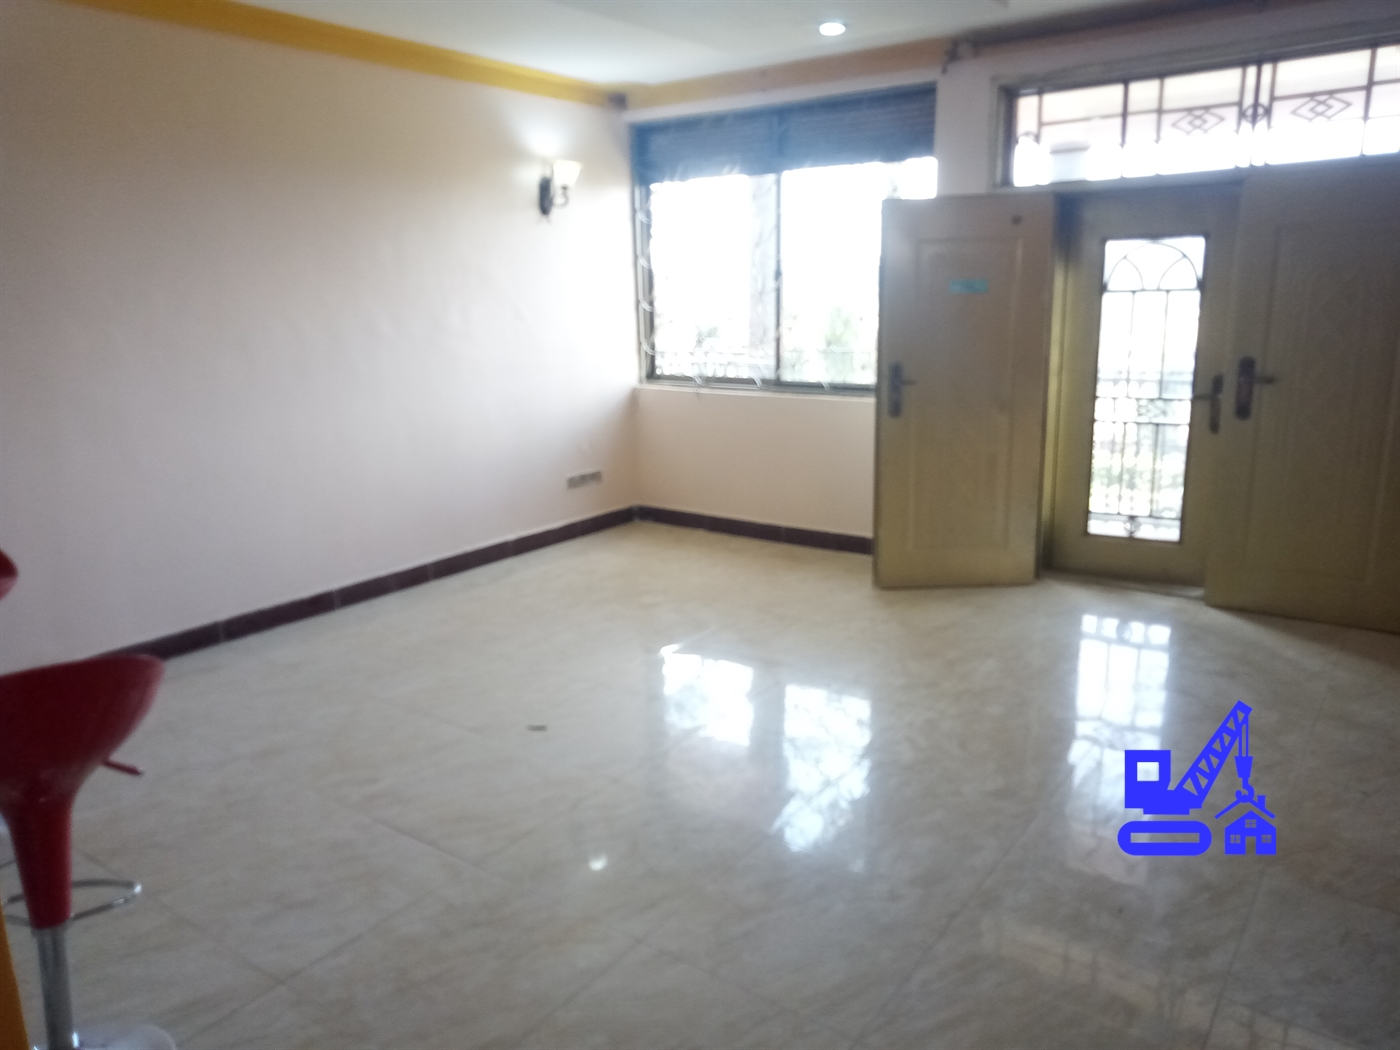 Storeyed house for rent in Kyanjja Kampala